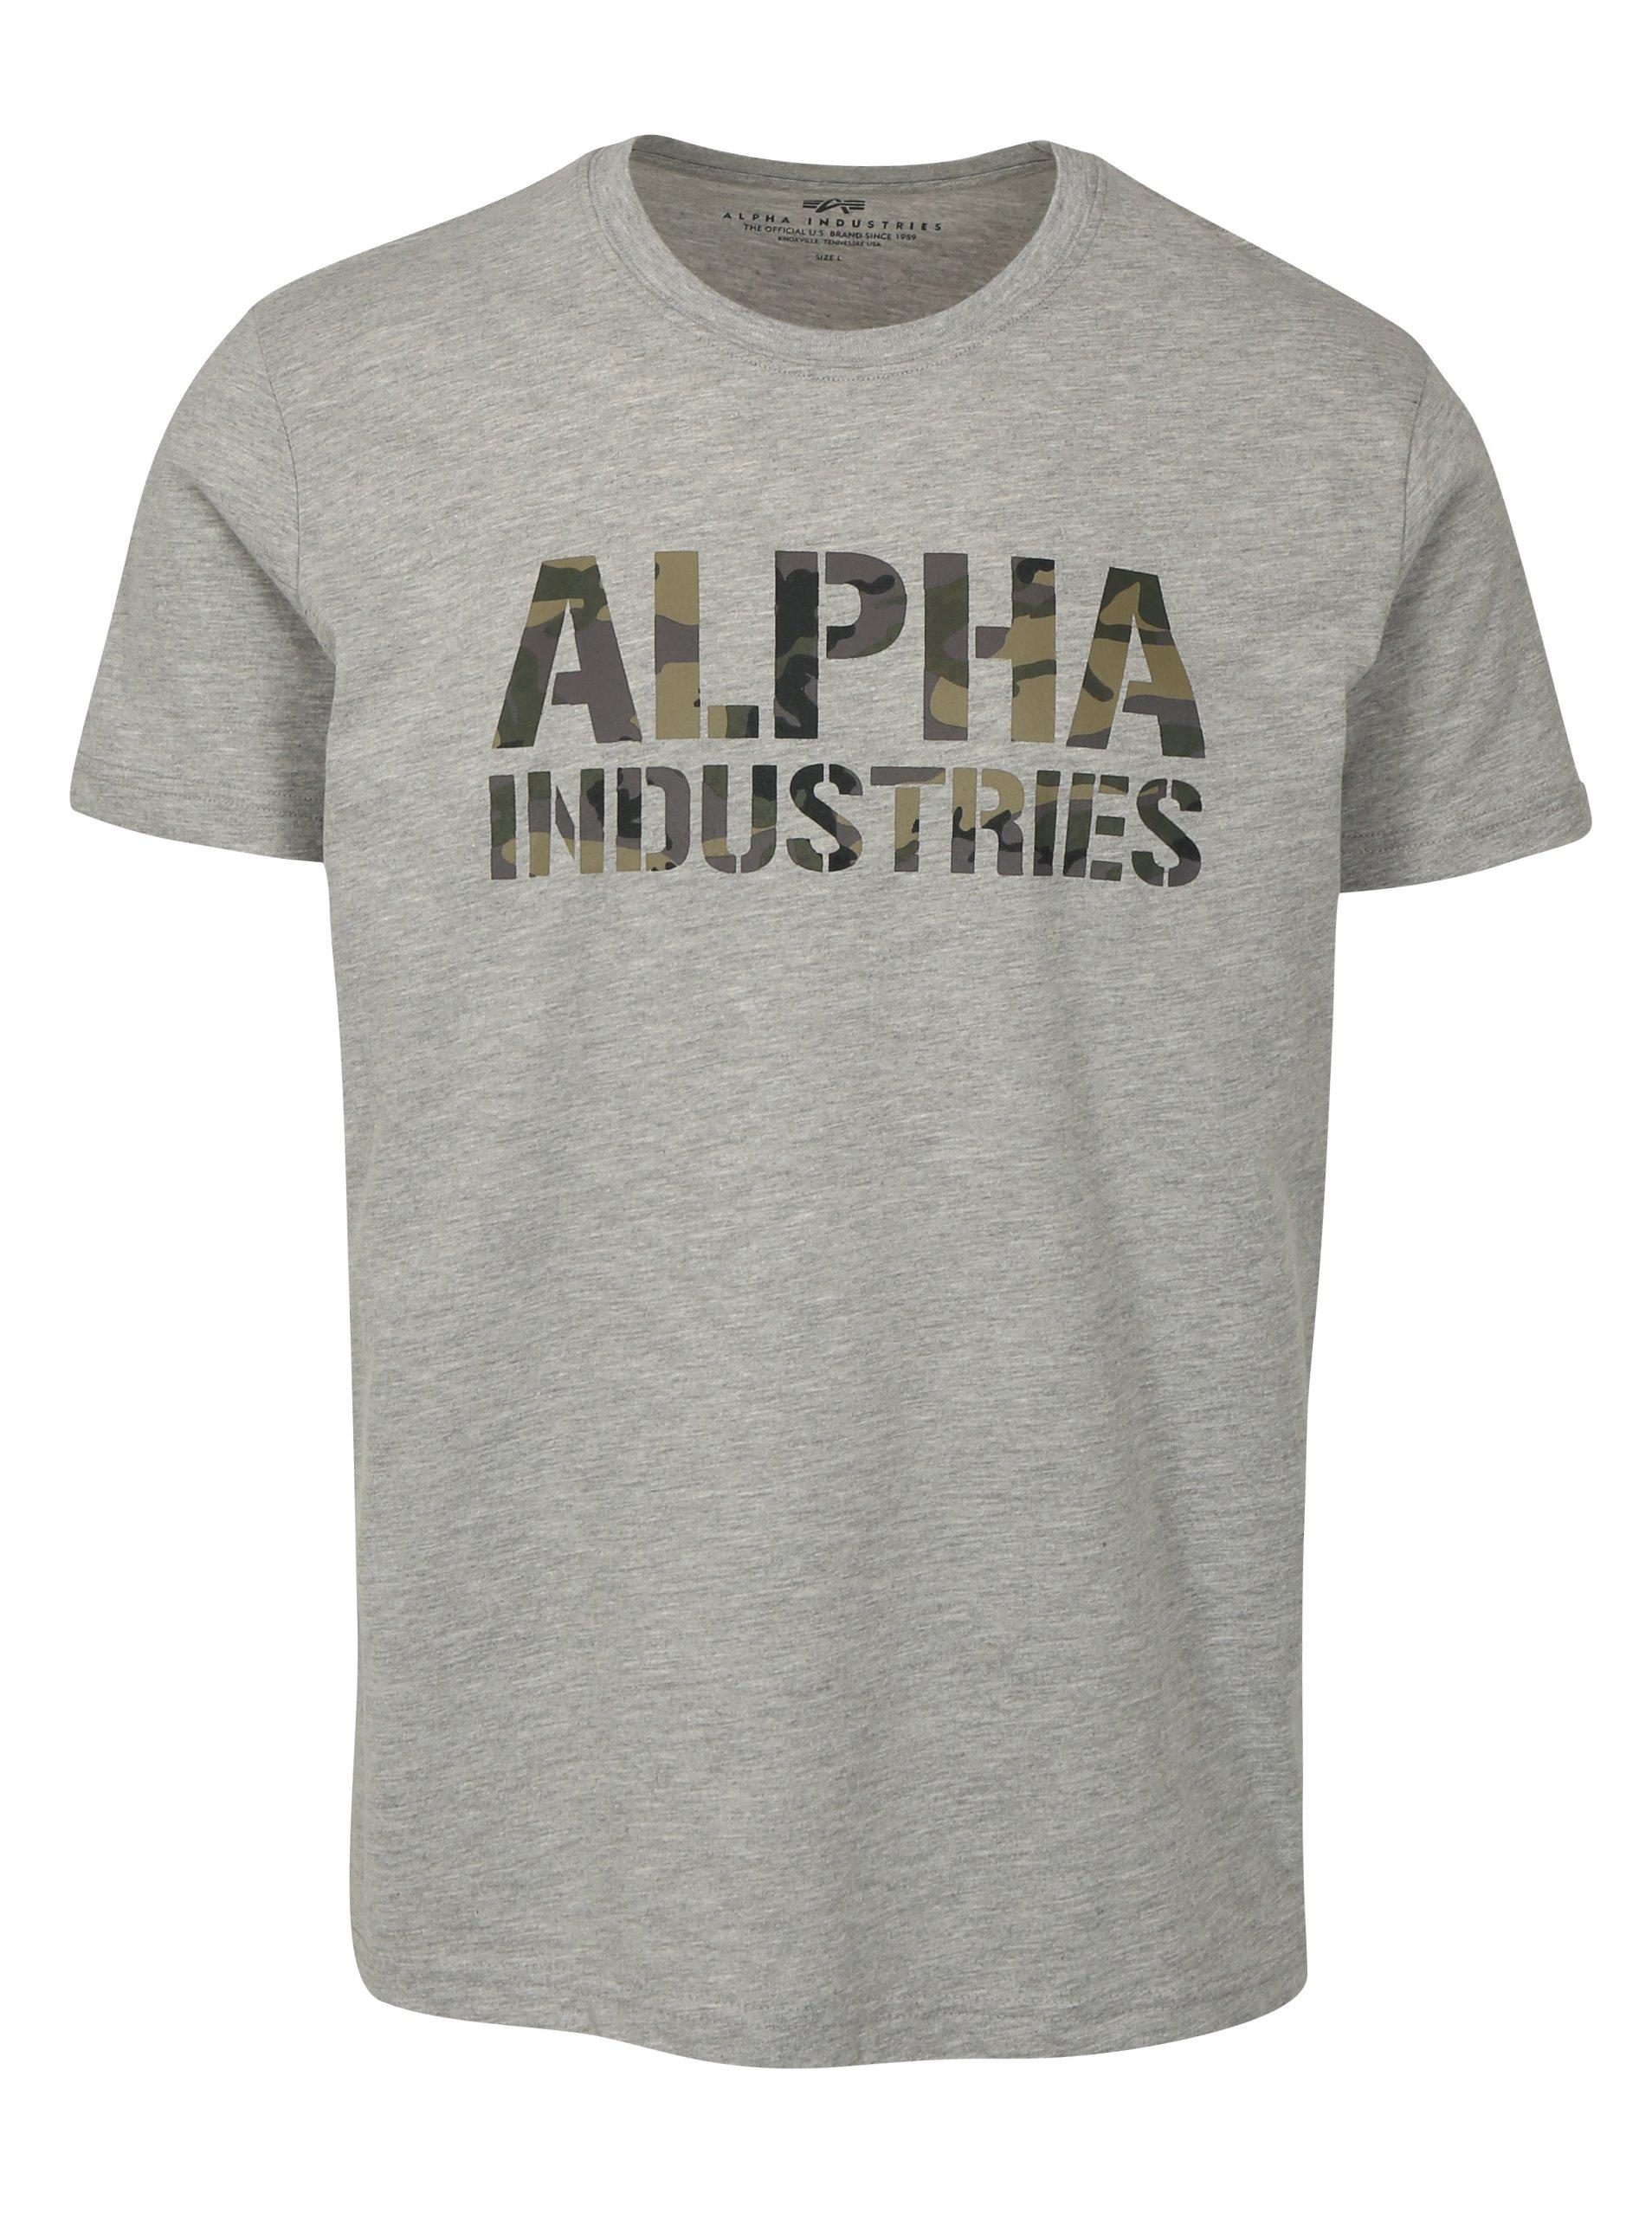 2ec8c5eec73a Sivé pánske tričko s potlačou ALPHA INDUSTRIES